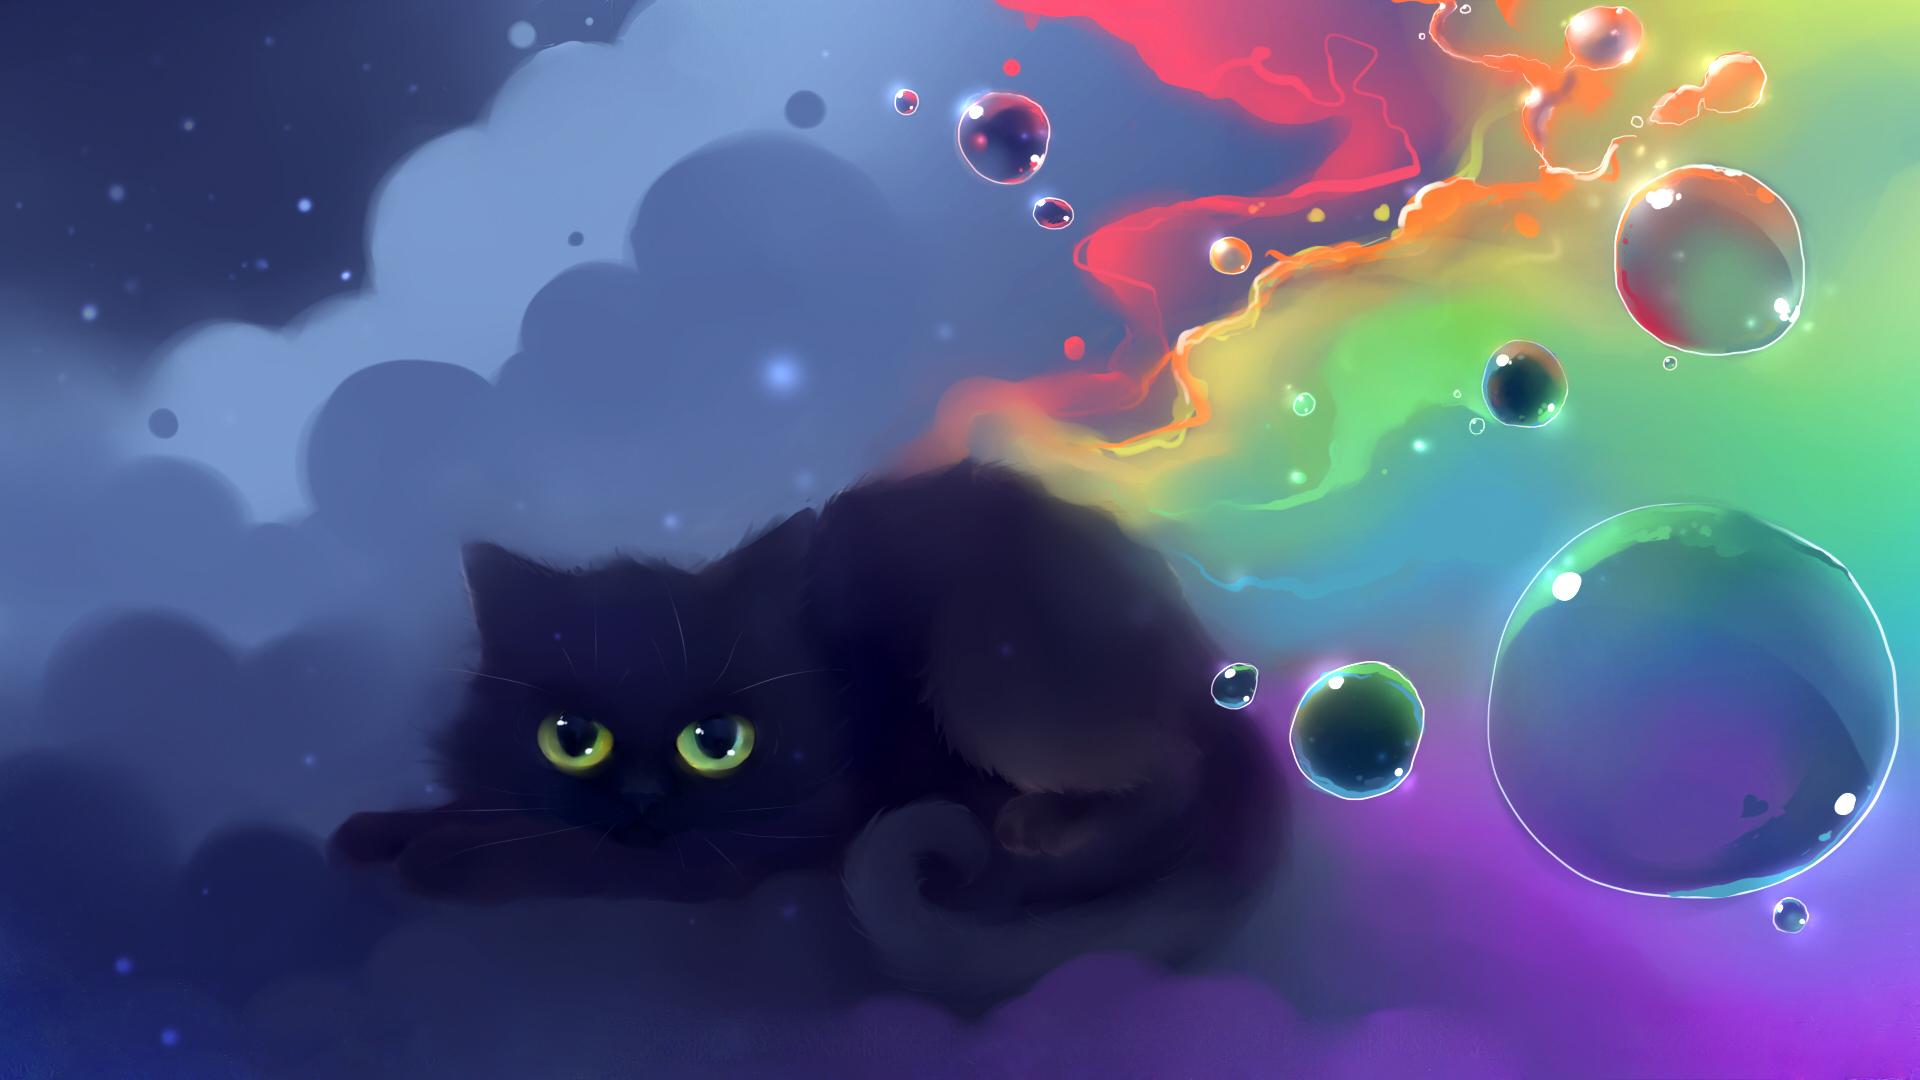 Nyan Cat Wallpaper Hd Nyan Cat Wallpapers Free Download Pixelstalk Net